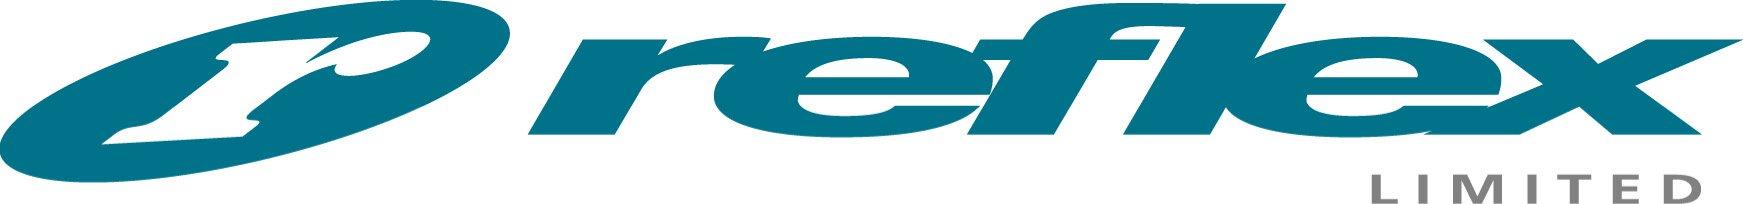 image of Reflex Limited logo